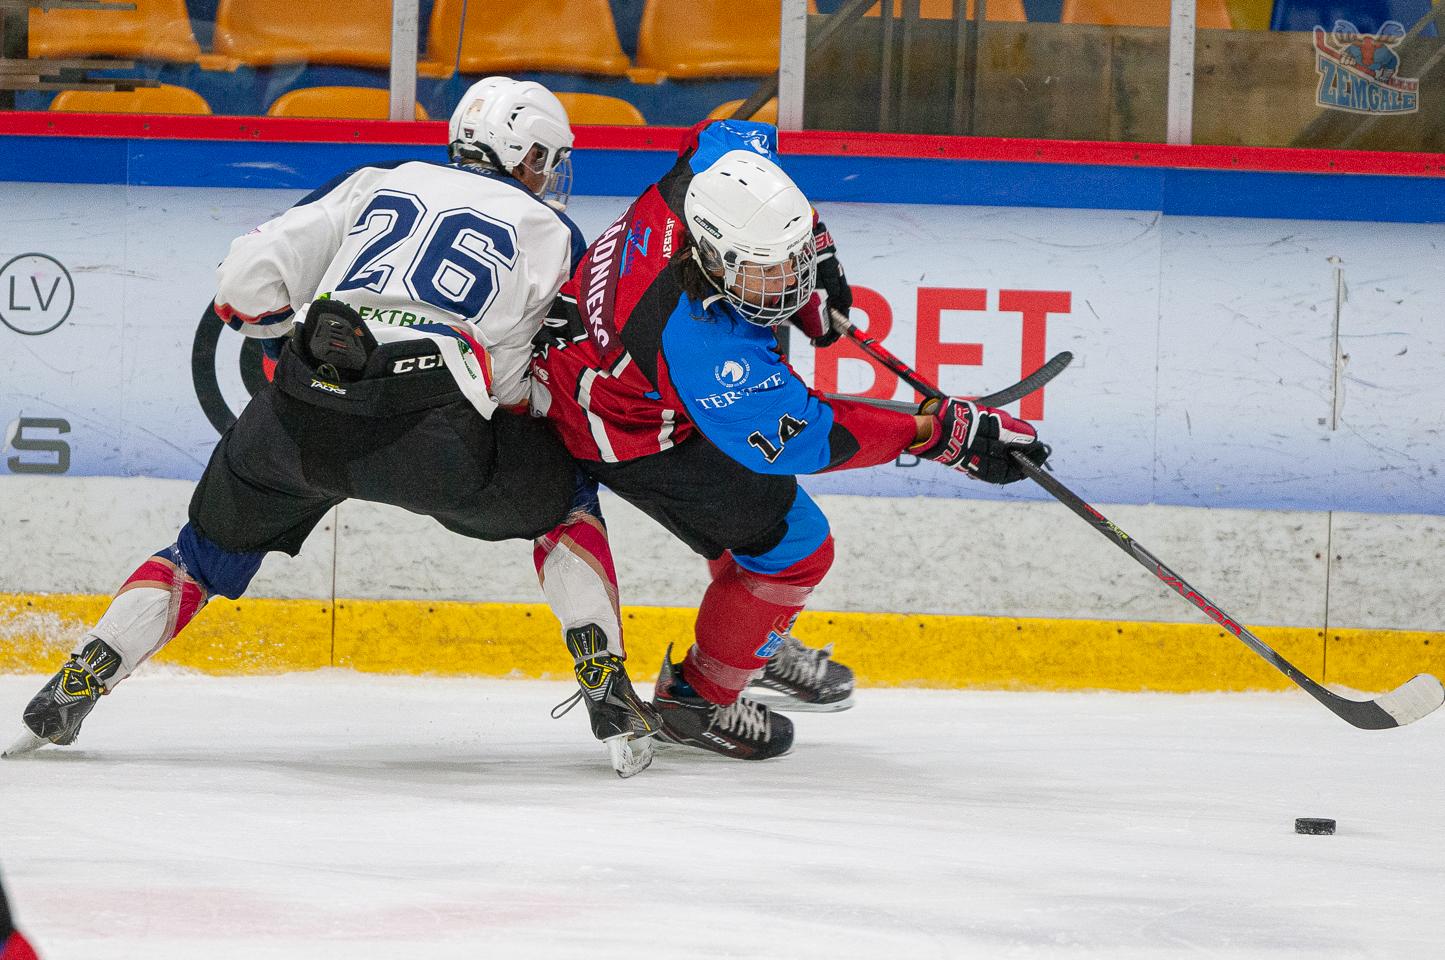 Jelgavas hokeja skola JLSS U17 - Venta 2002 14092019-15